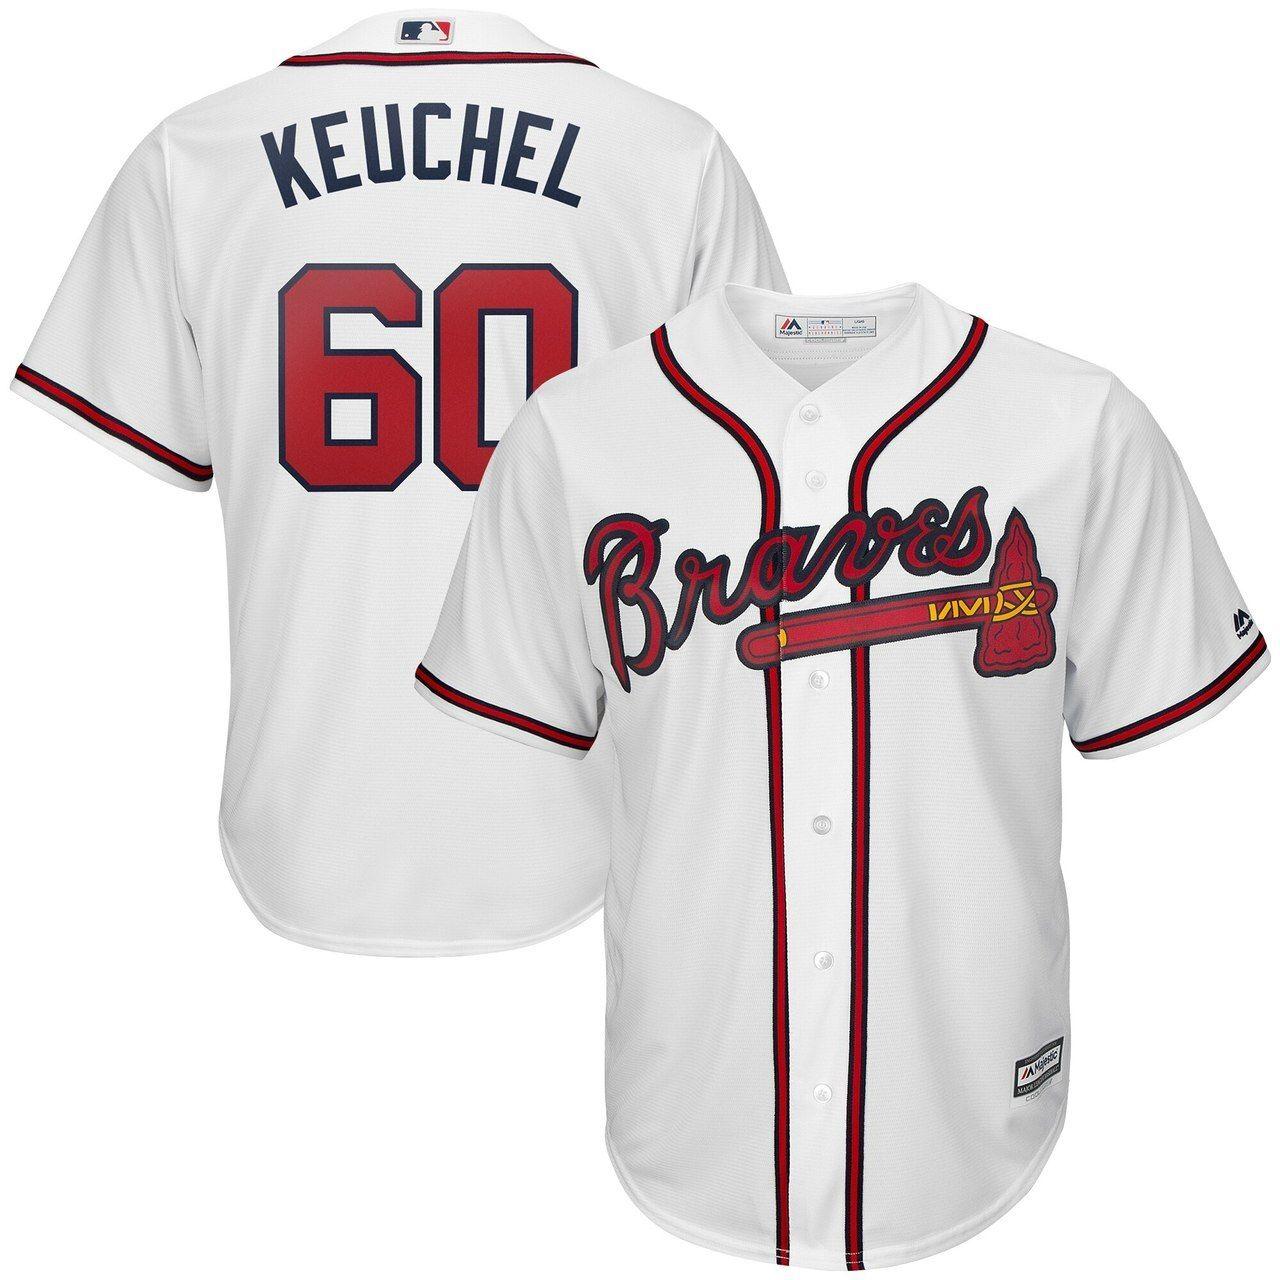 Dallas Keuchel Atlanta Braves 60 Jersey White Atlanta Braves Jersey Braves Jersey Atlanta Braves